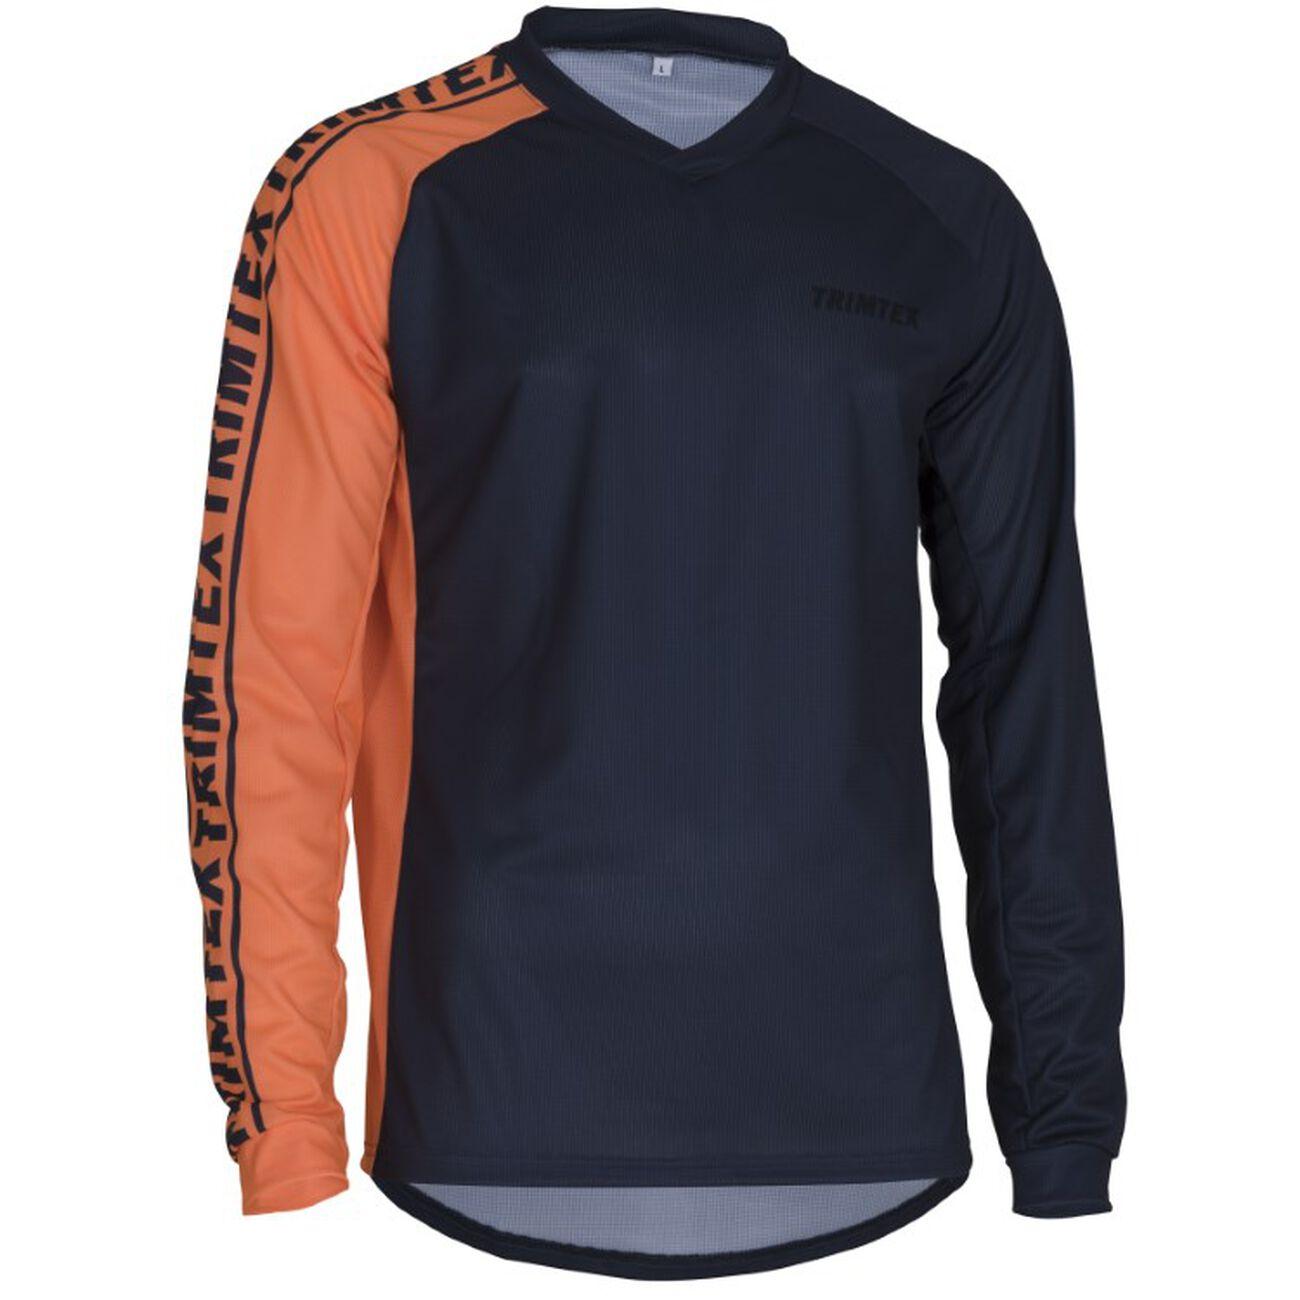 Enduro Shirt LS